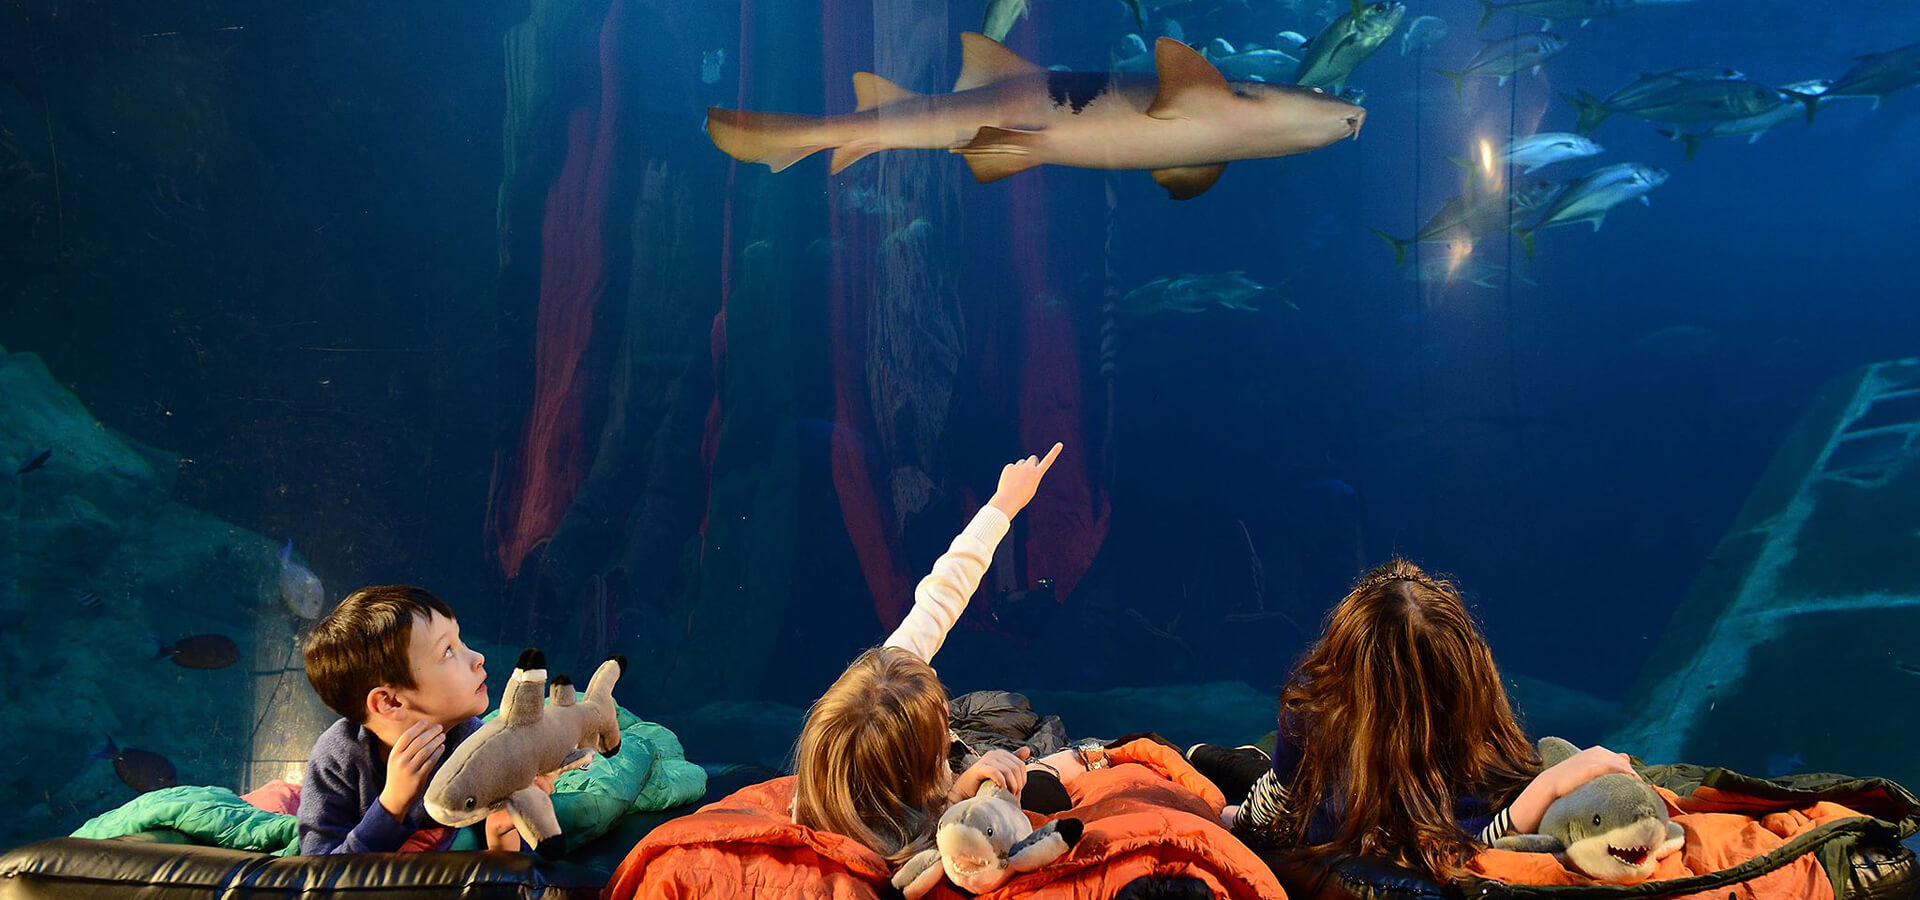 Plymouth-Attraction-National-Marine-Aquarium-UK.jpg